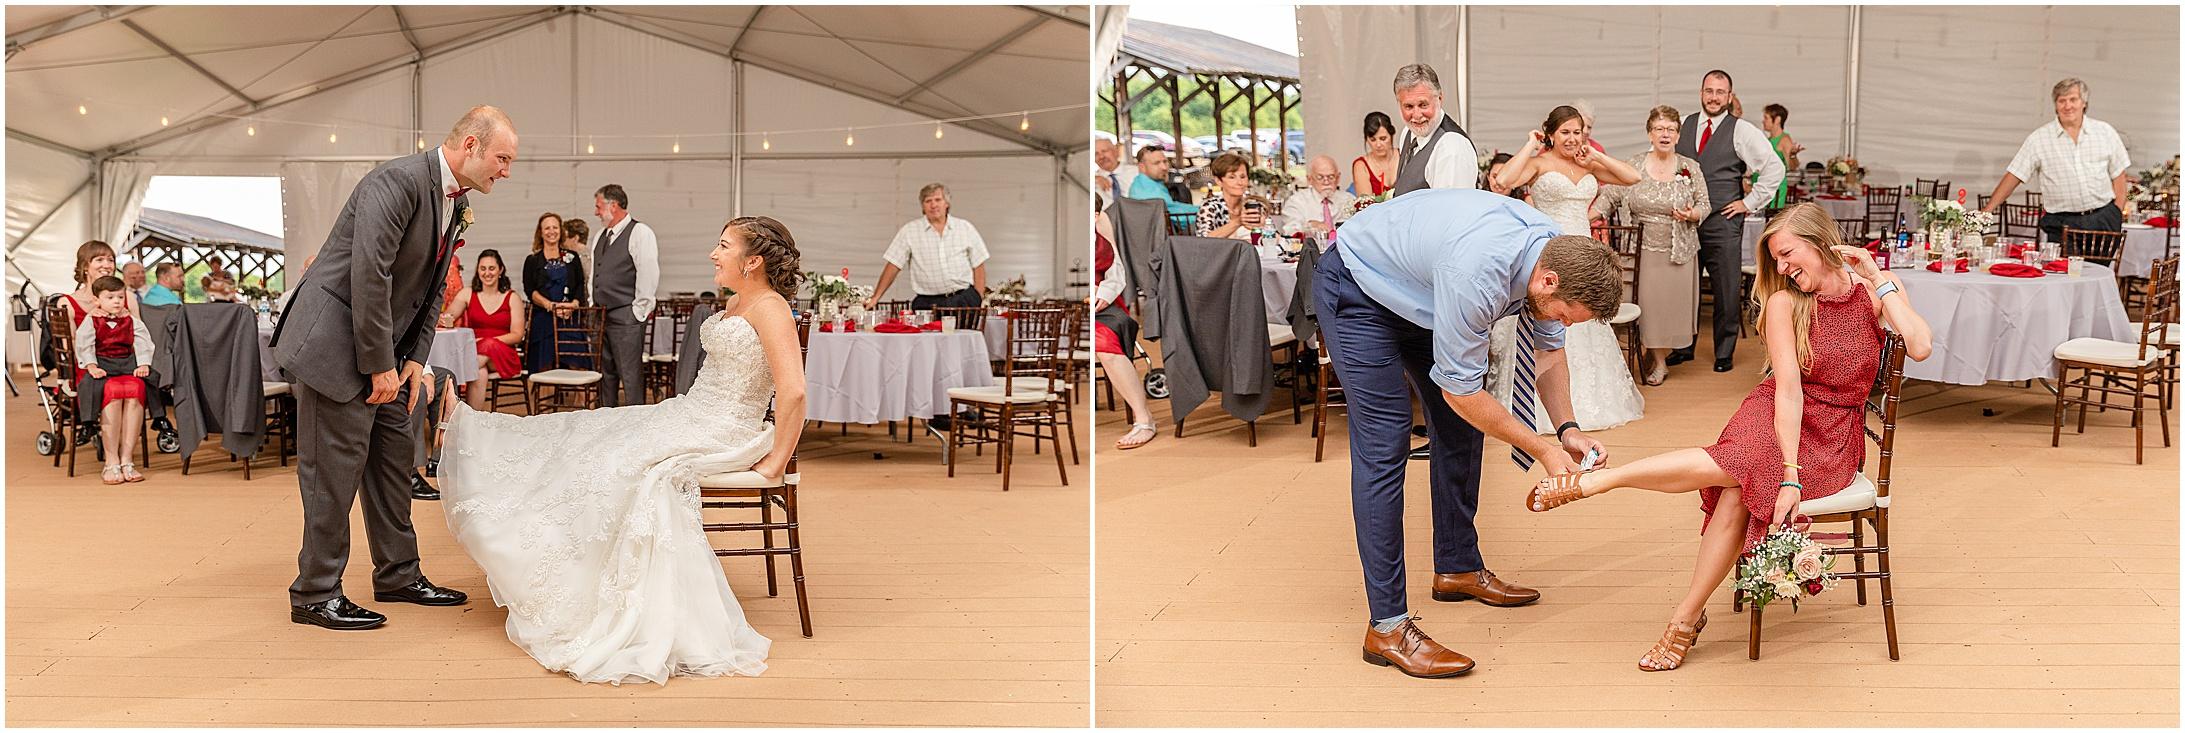 The-Royer-House-Wedding-Photos_0447.jpg